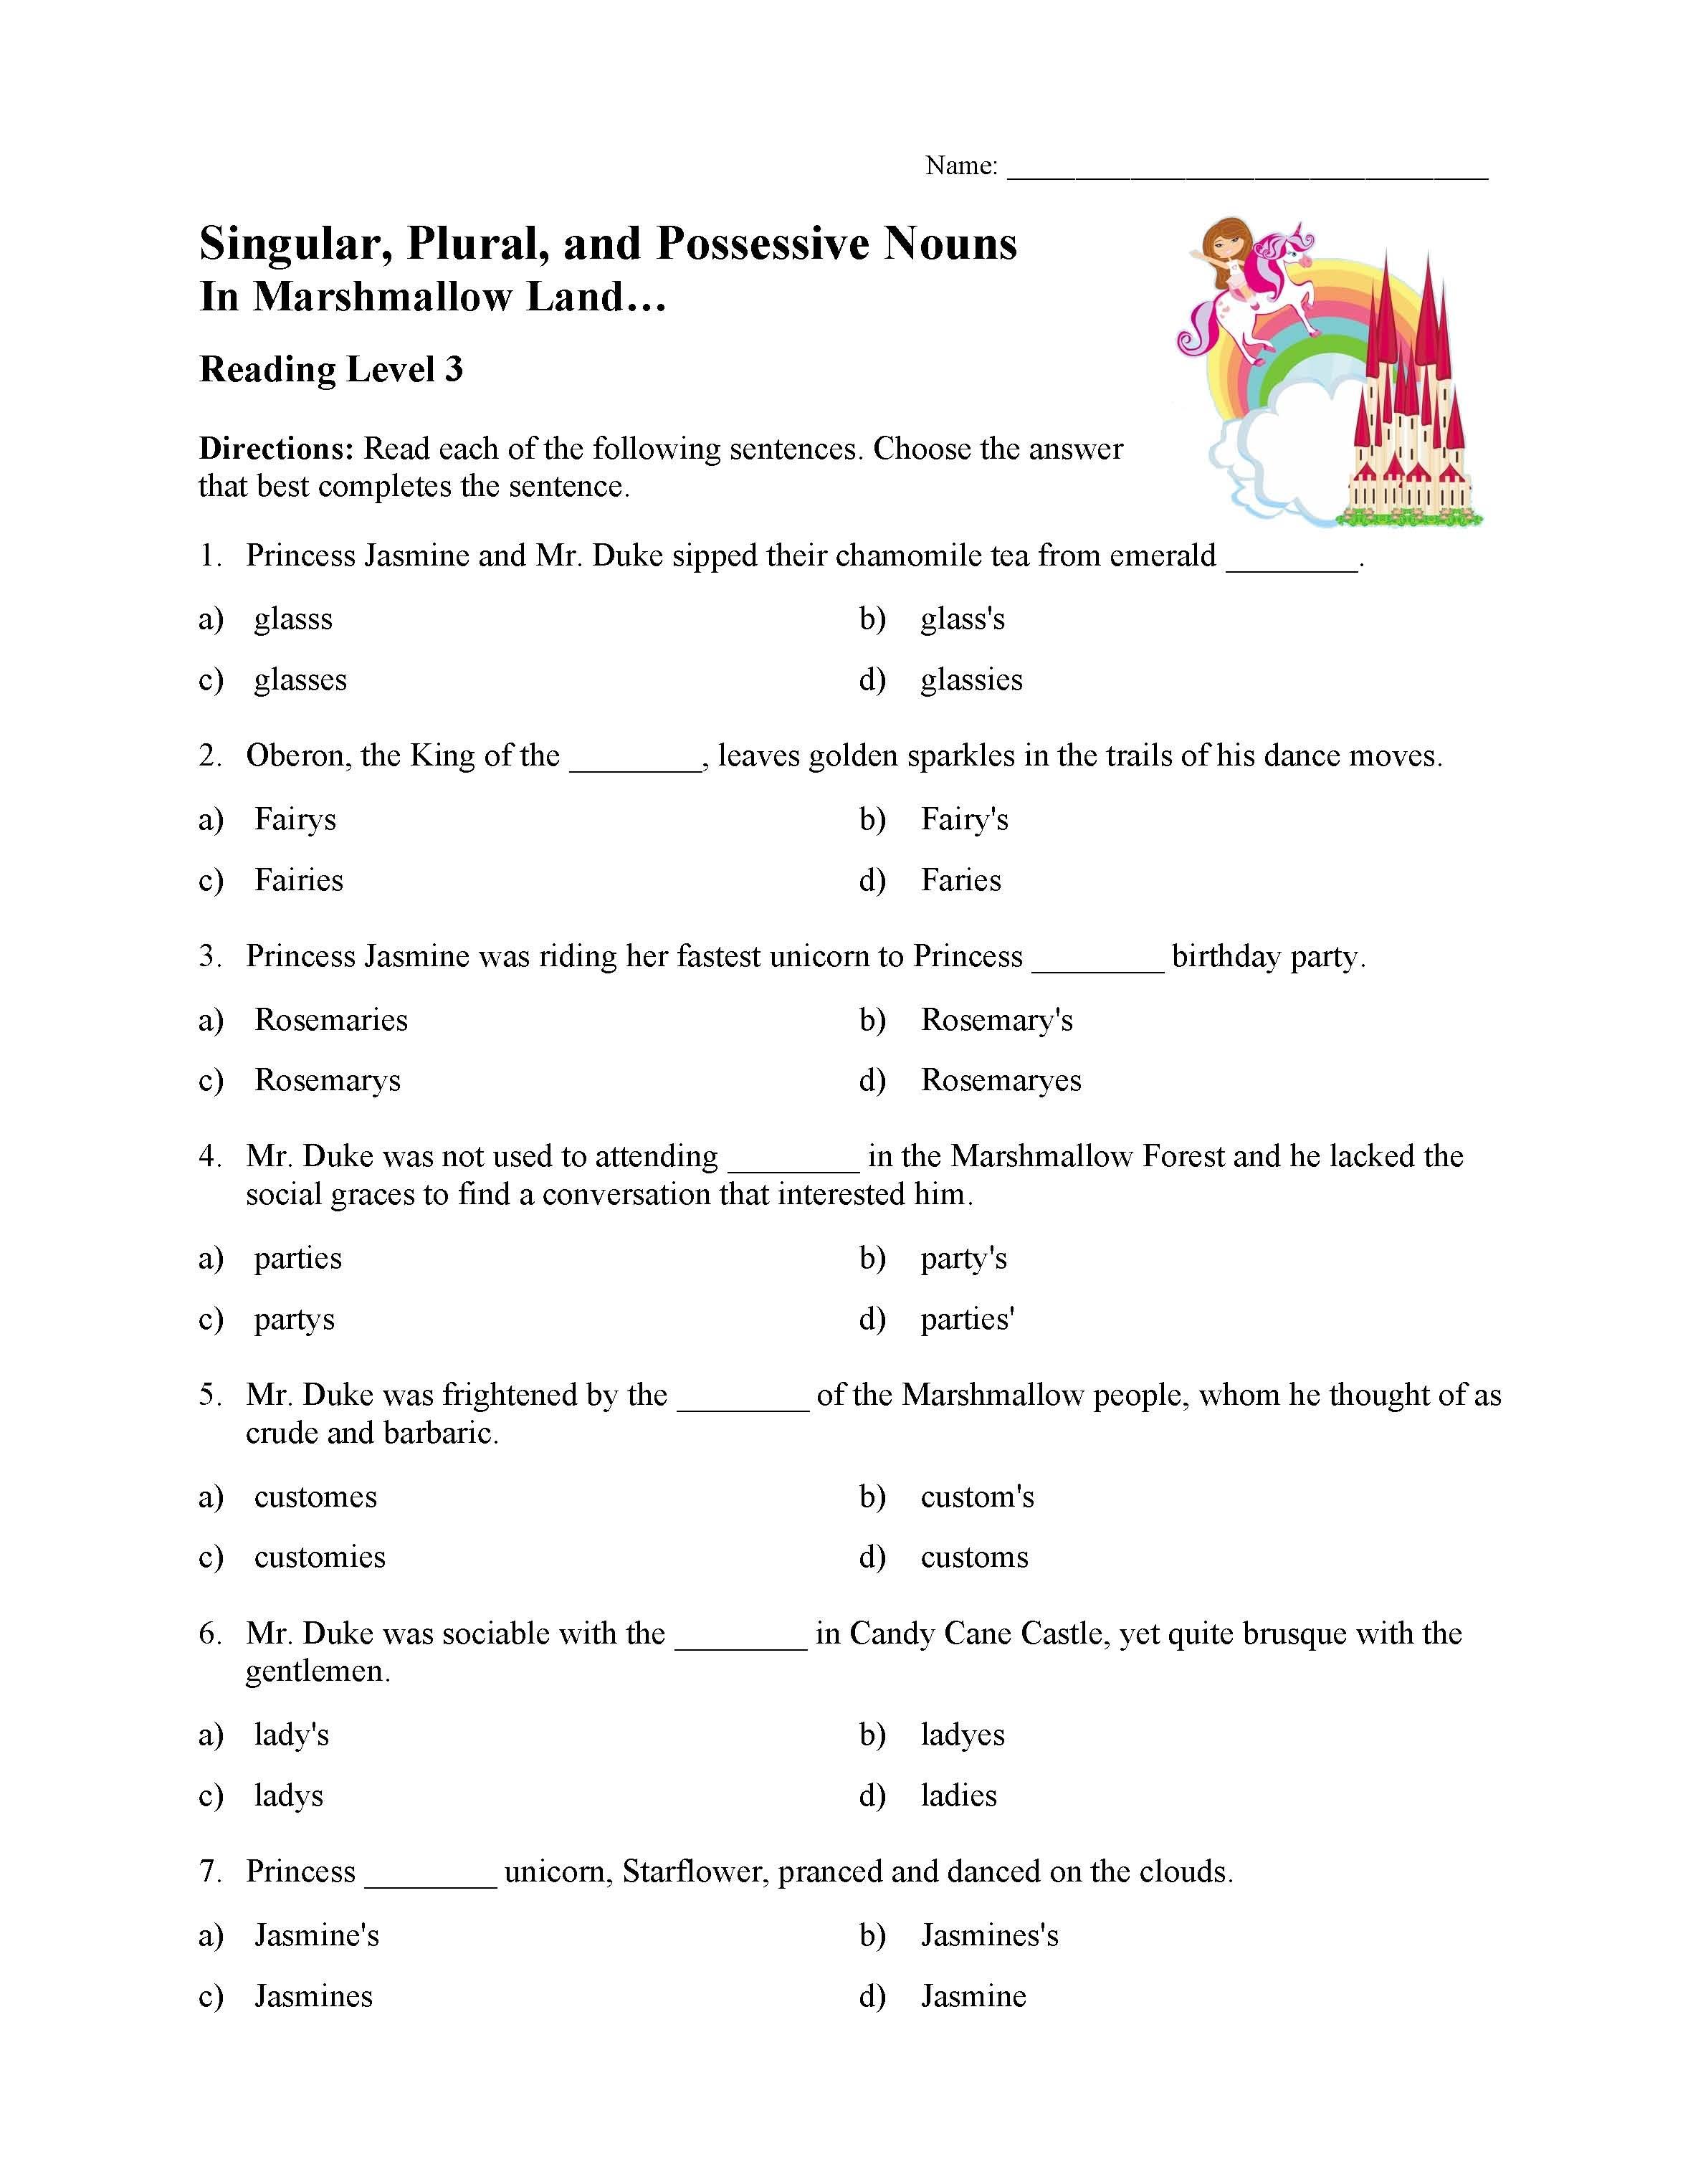 Singular Plural And Possessive Nouns Test 1